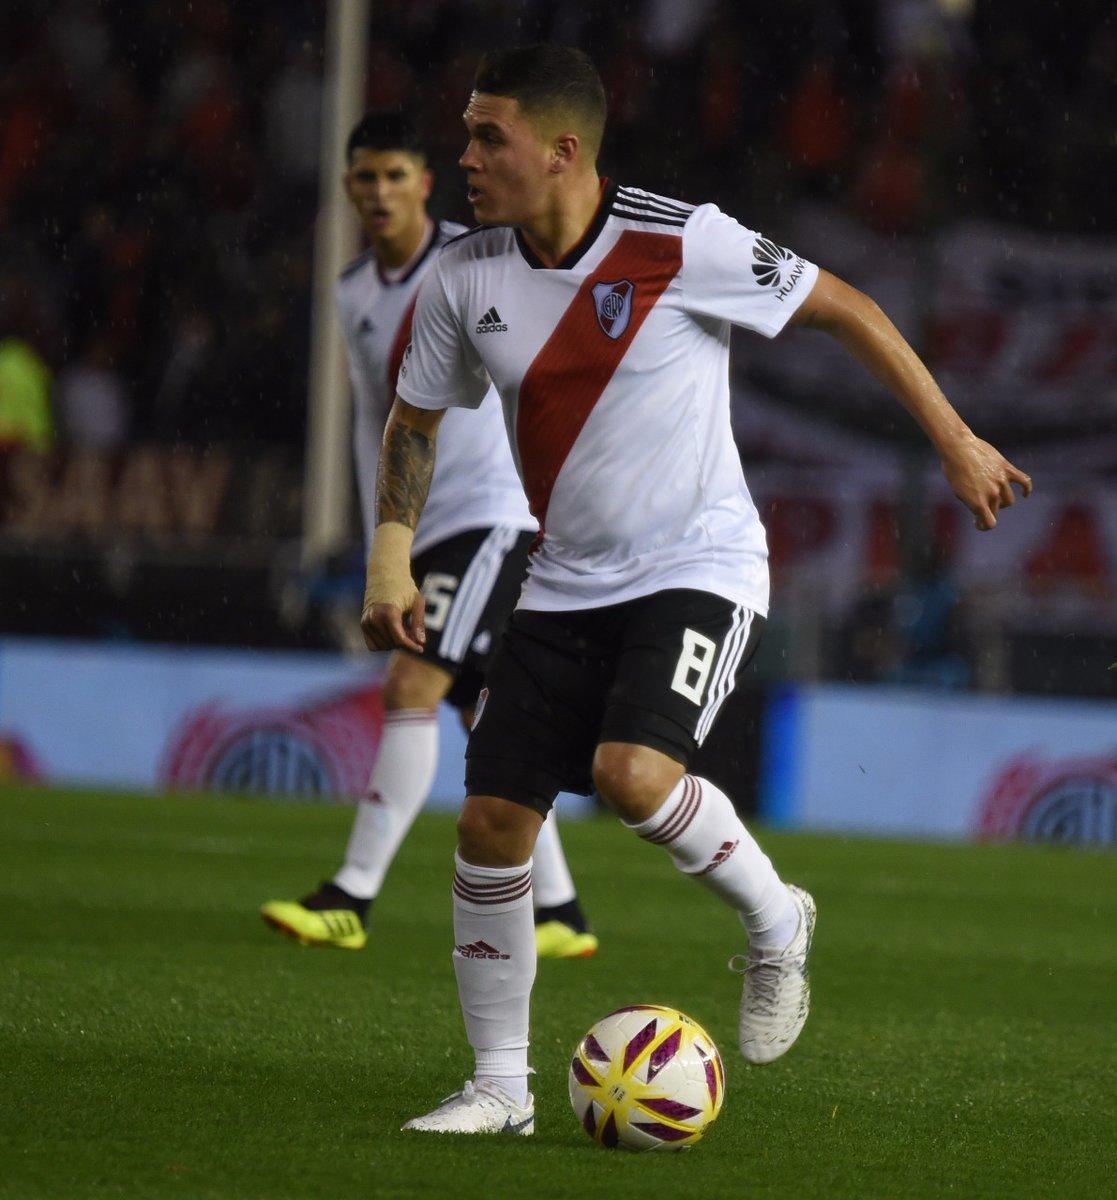 Julián Capera's photo on Copa América